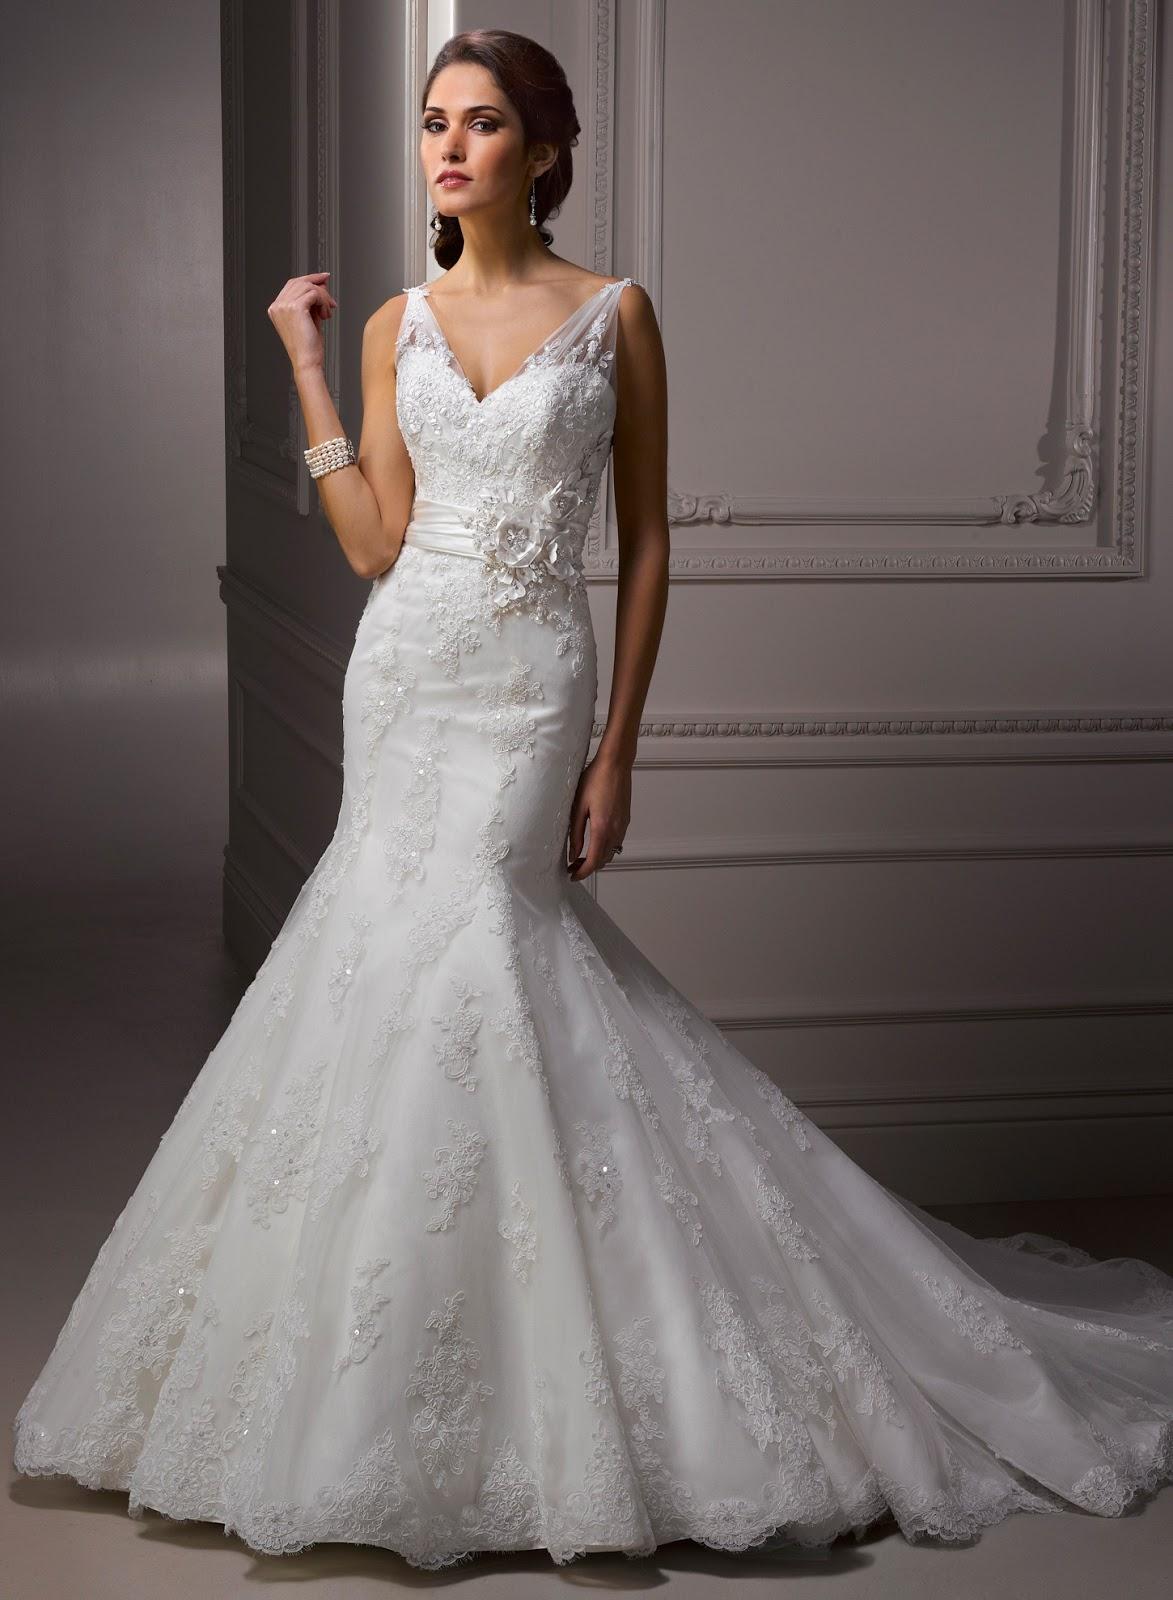 Fashion Make Up 66 Types Of Wedding Dresses